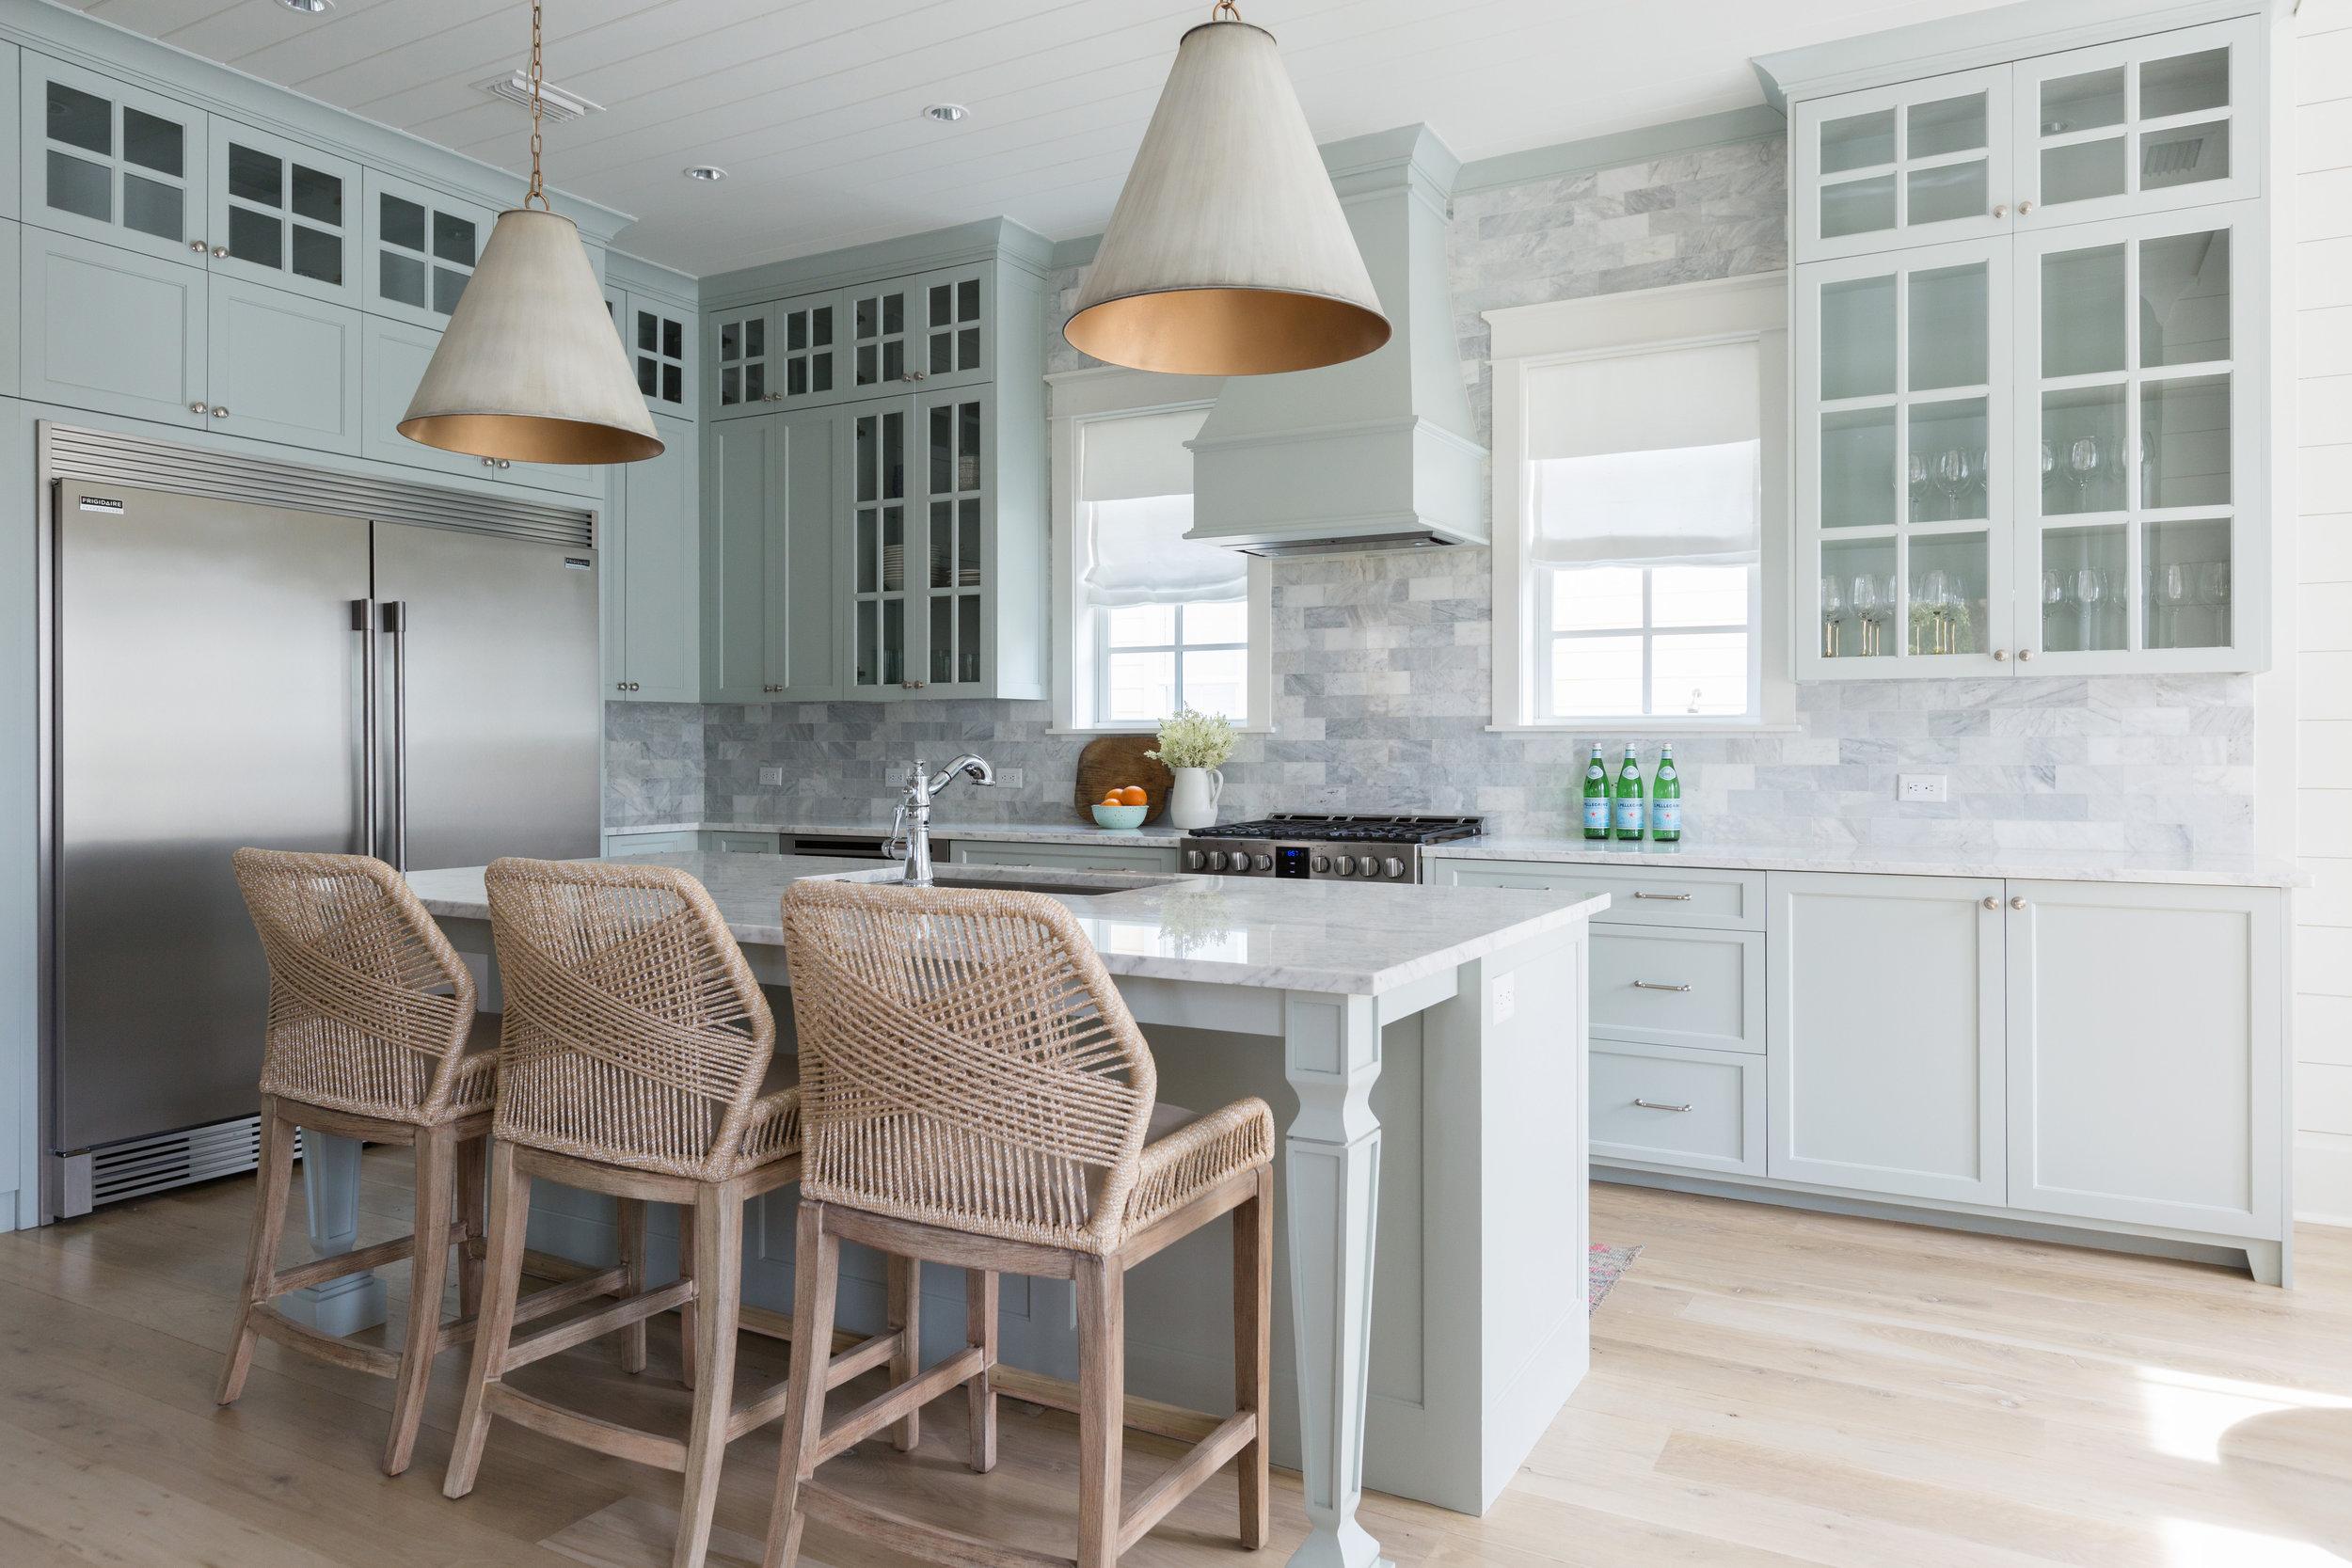 Beautiful kitchen with marble backsplash and huge pendant lighting and love the rope counter stools kellyelko.com #kitchens #lighting #kitchendecor #barstools